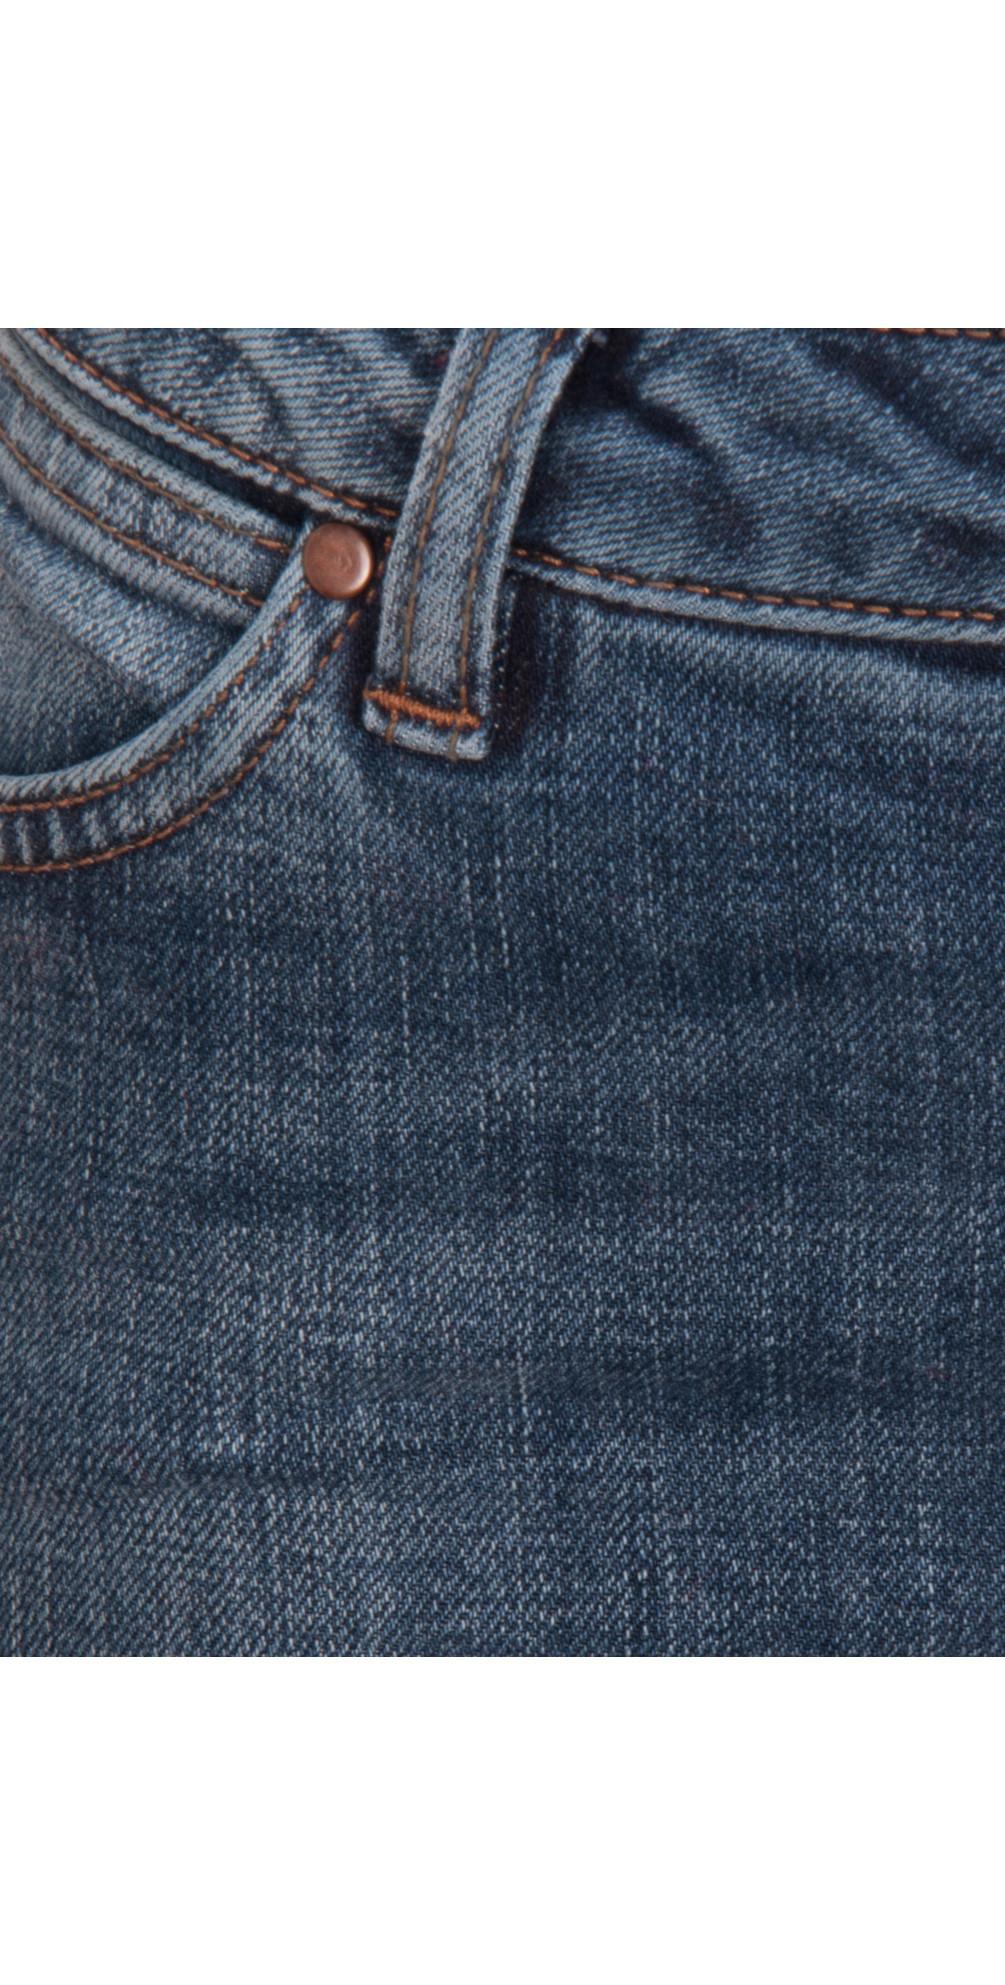 Pen-Oppic Cotton Jean main image